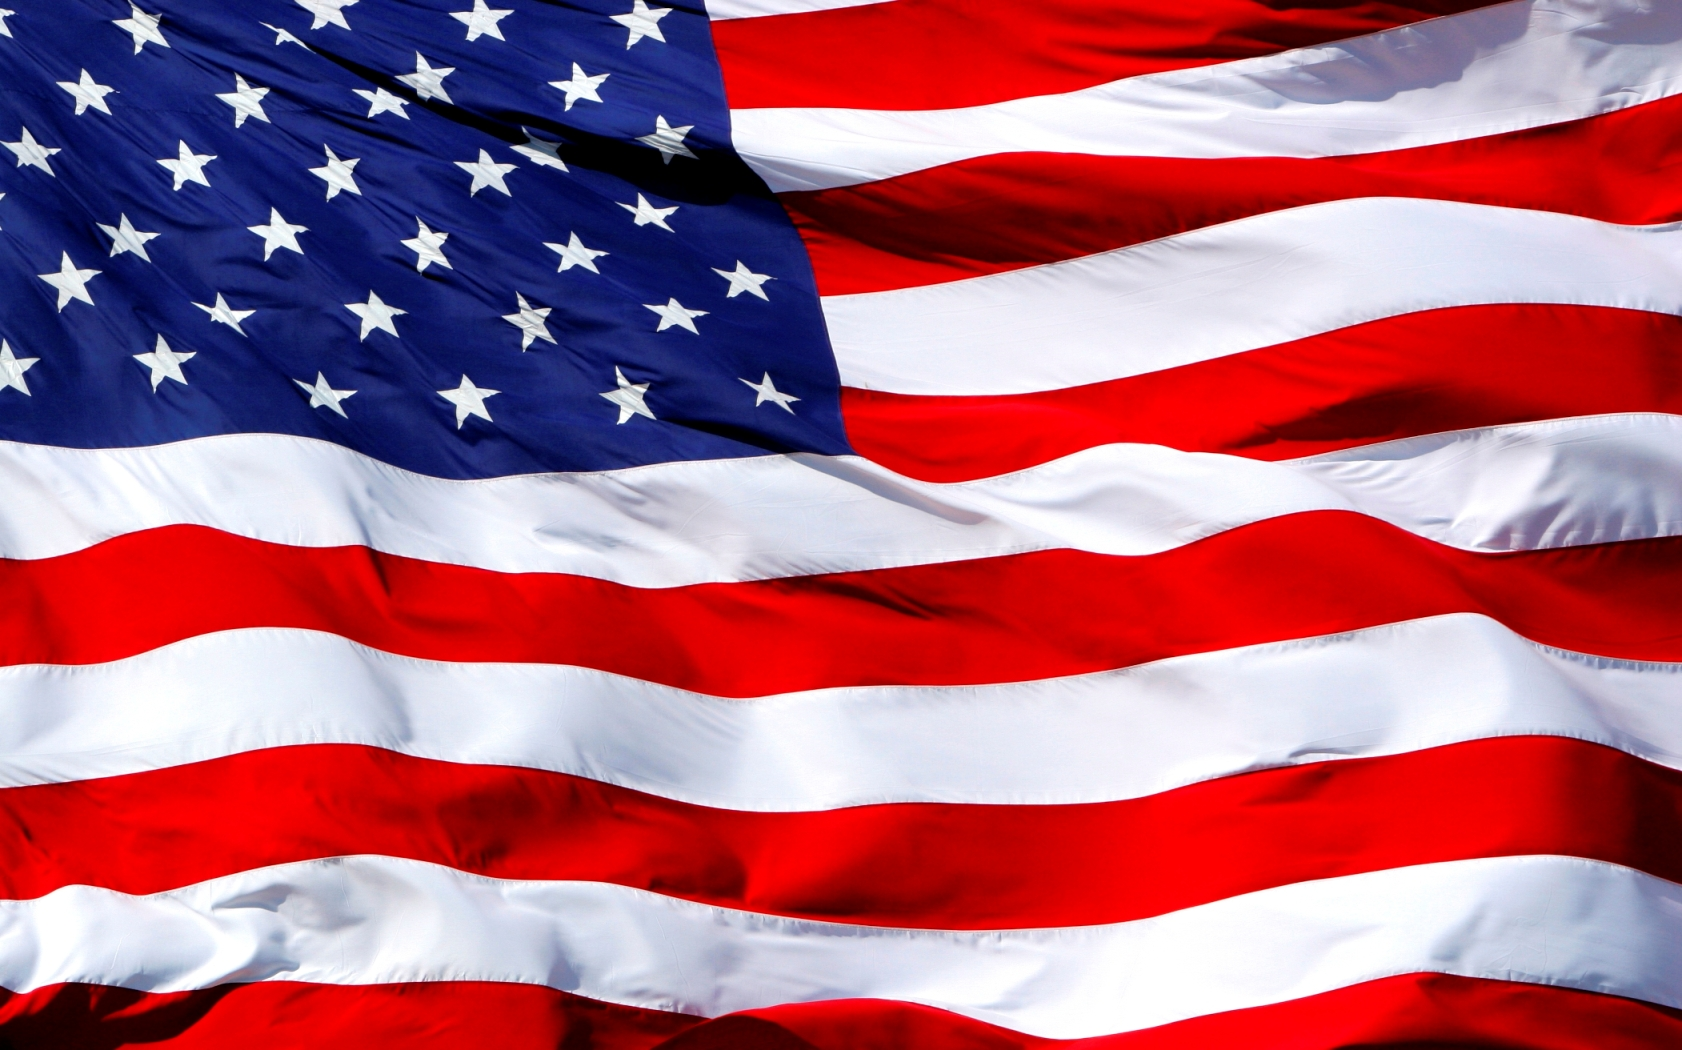 Wallpaper wallpaper American Flag Wallpaper hd wallpaper background 1682x1050